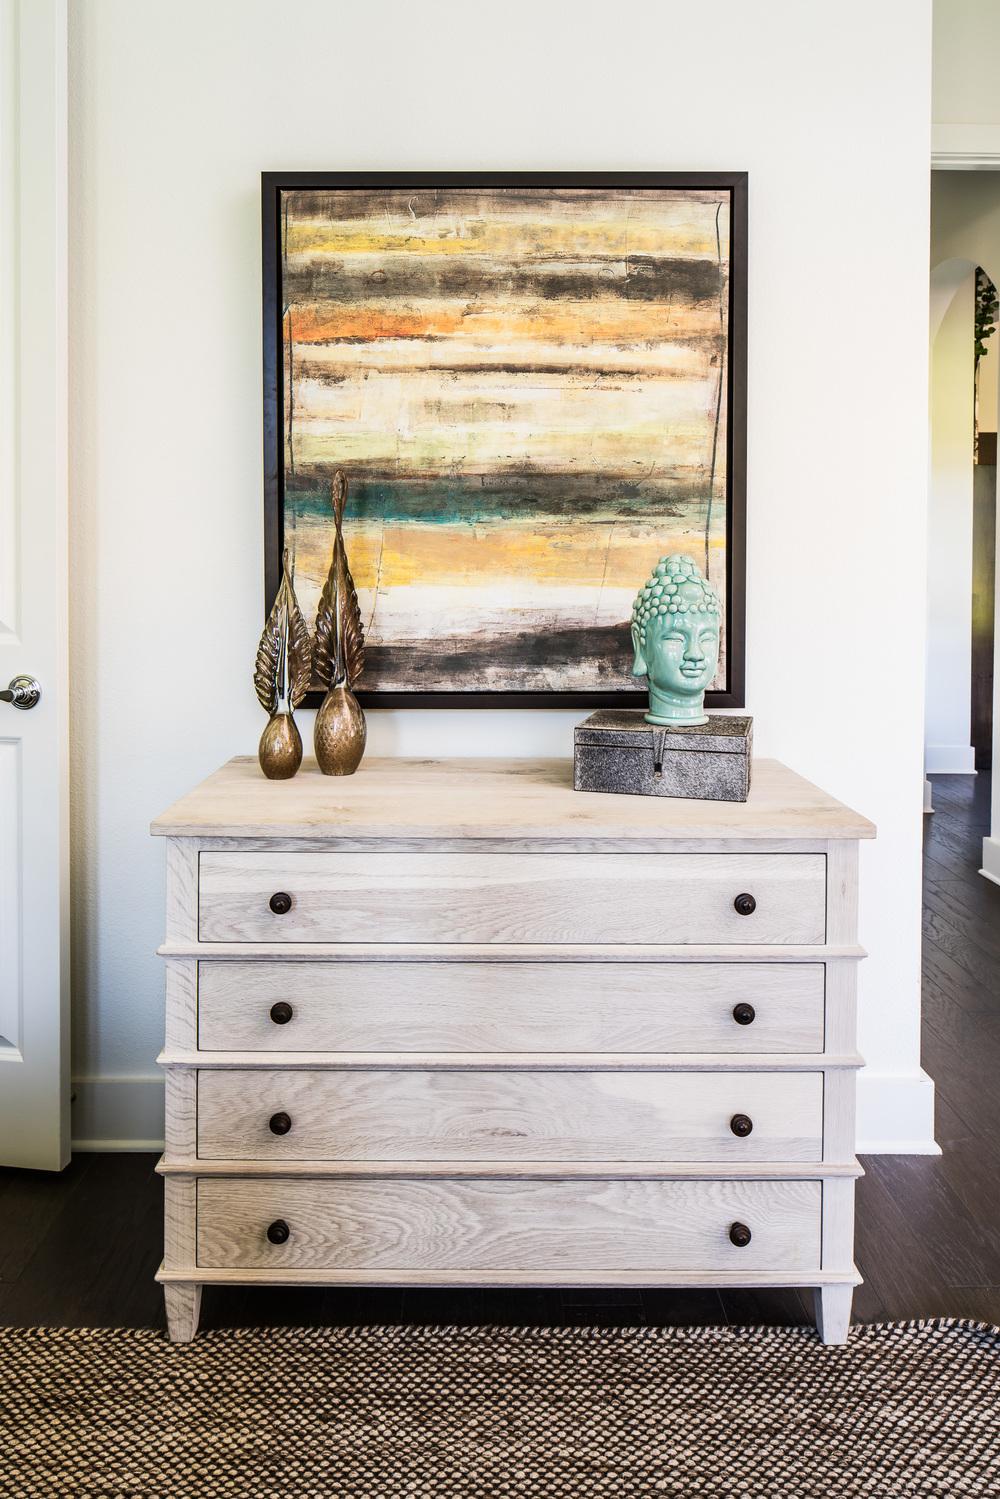 lori-caldwell-designs-interior-006.jpg